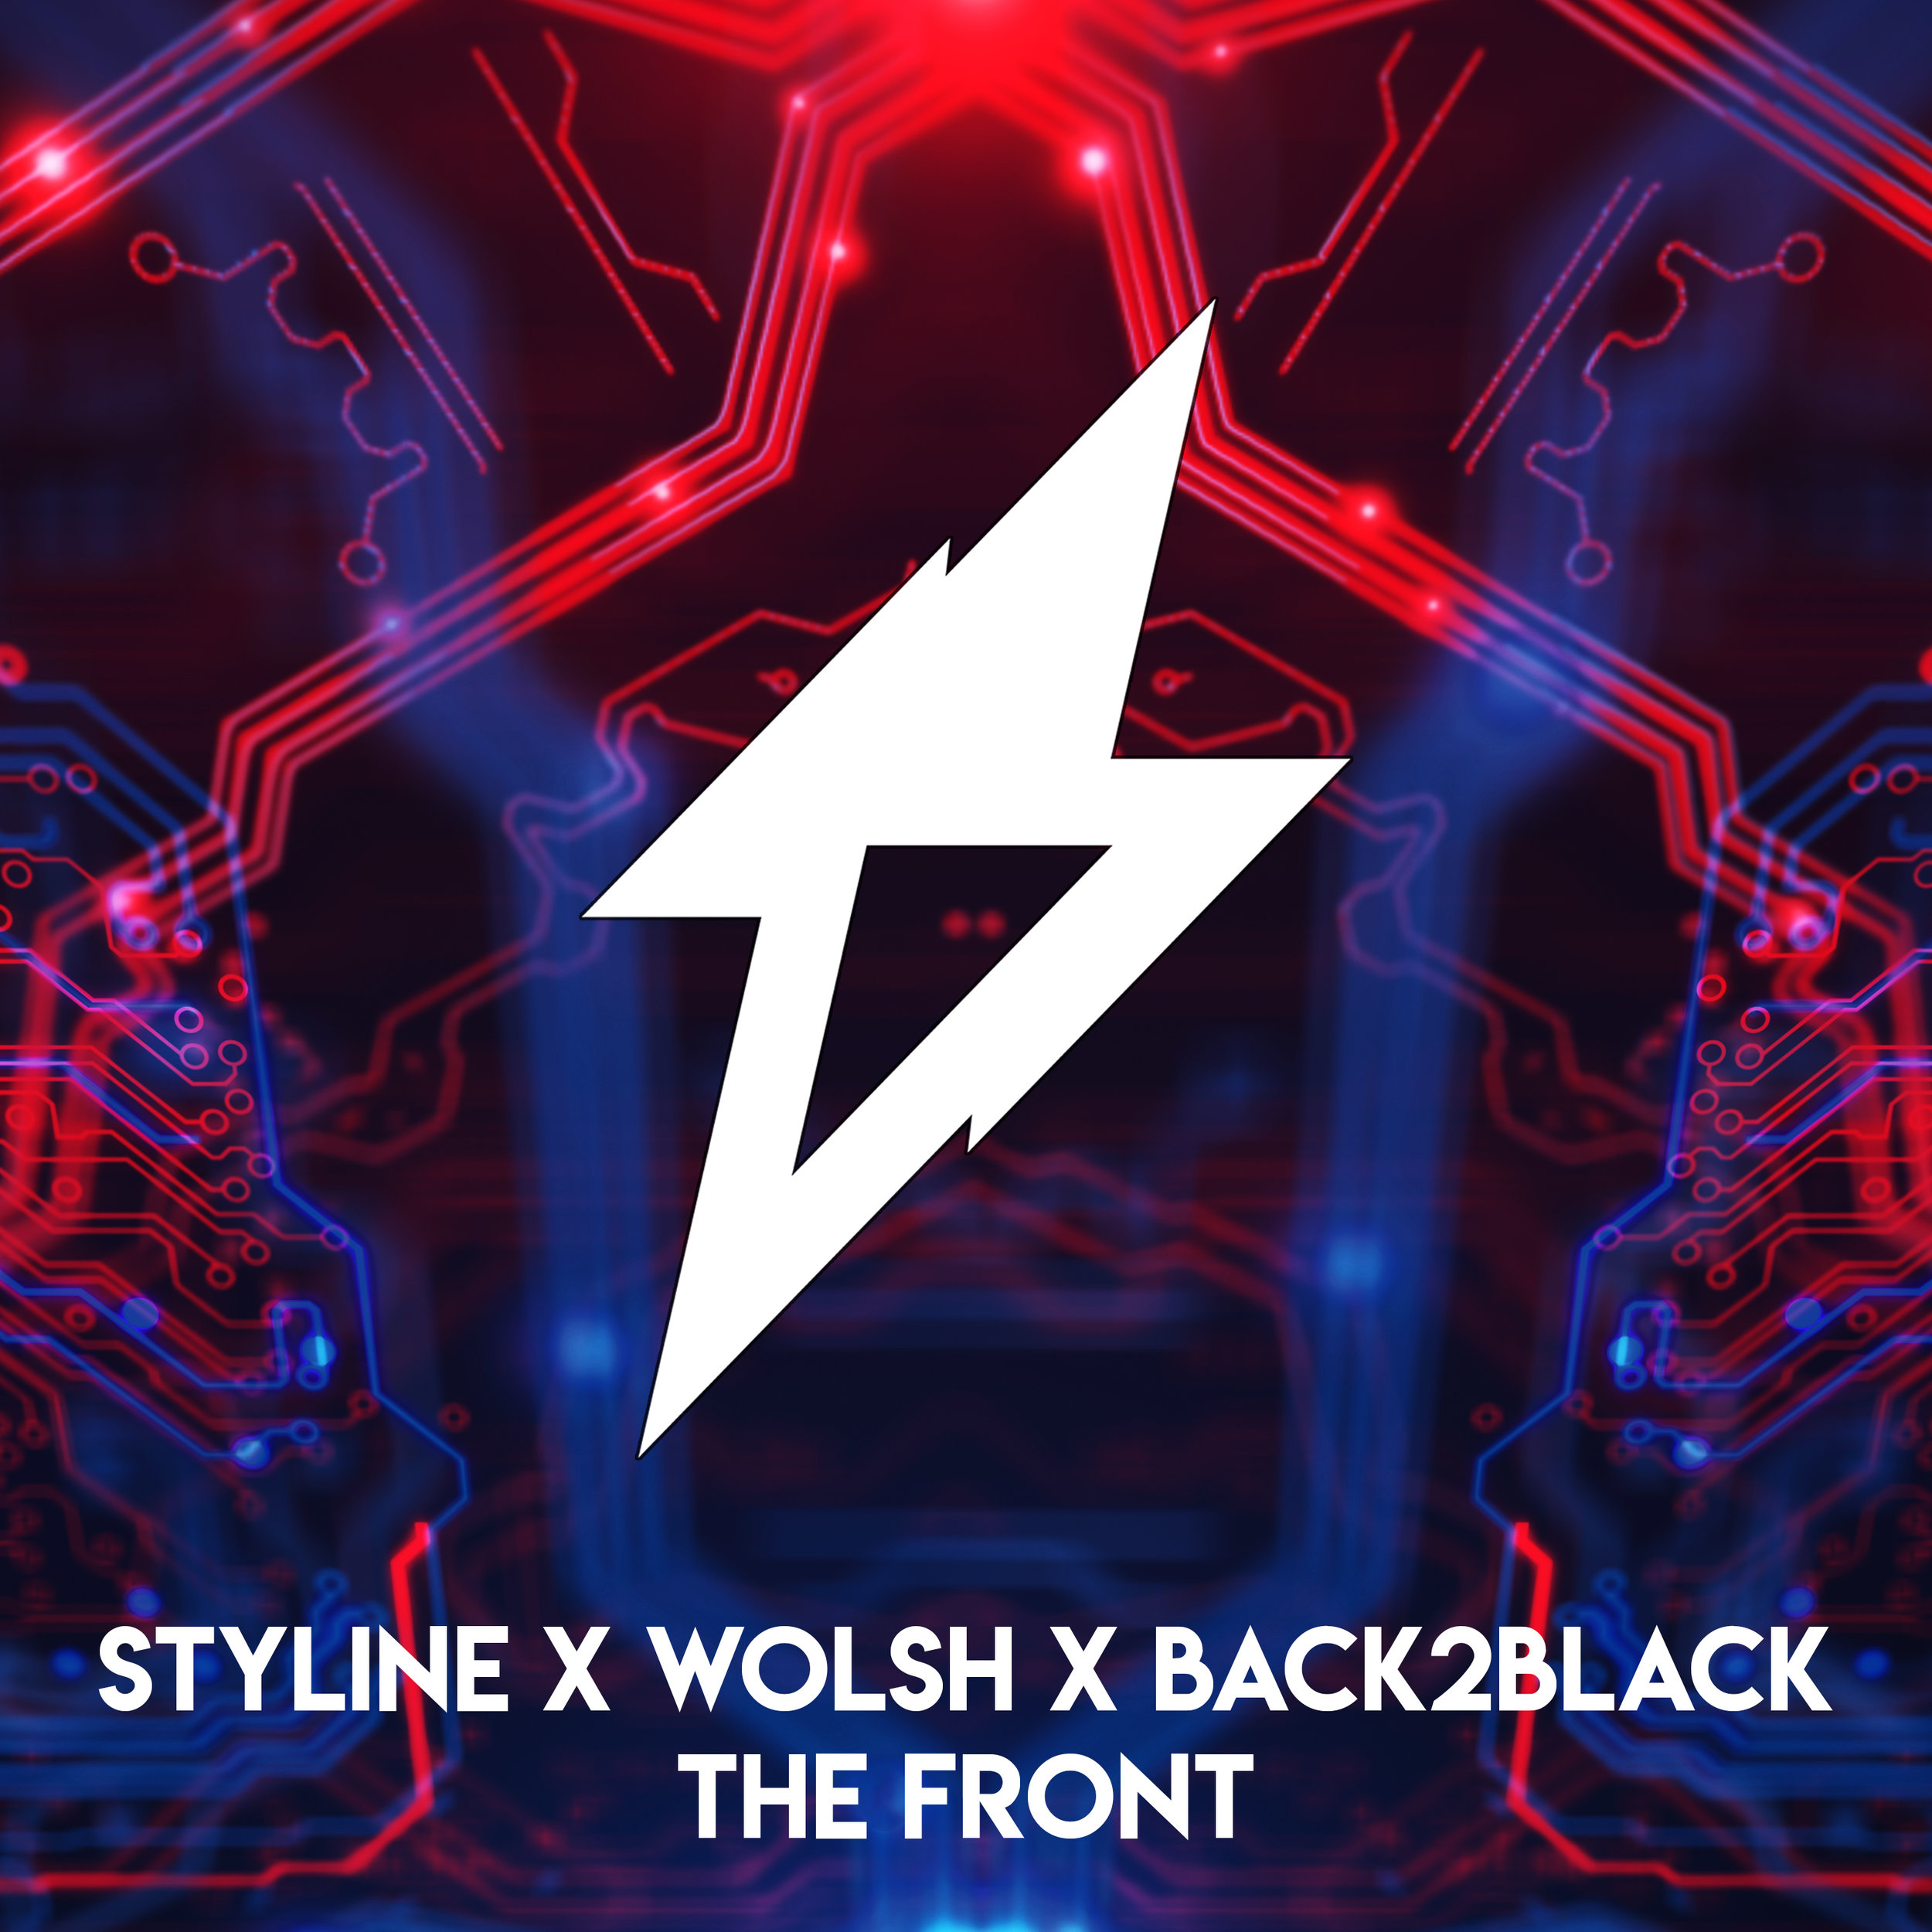 Styline X Wolsh X Back2Black - The Front